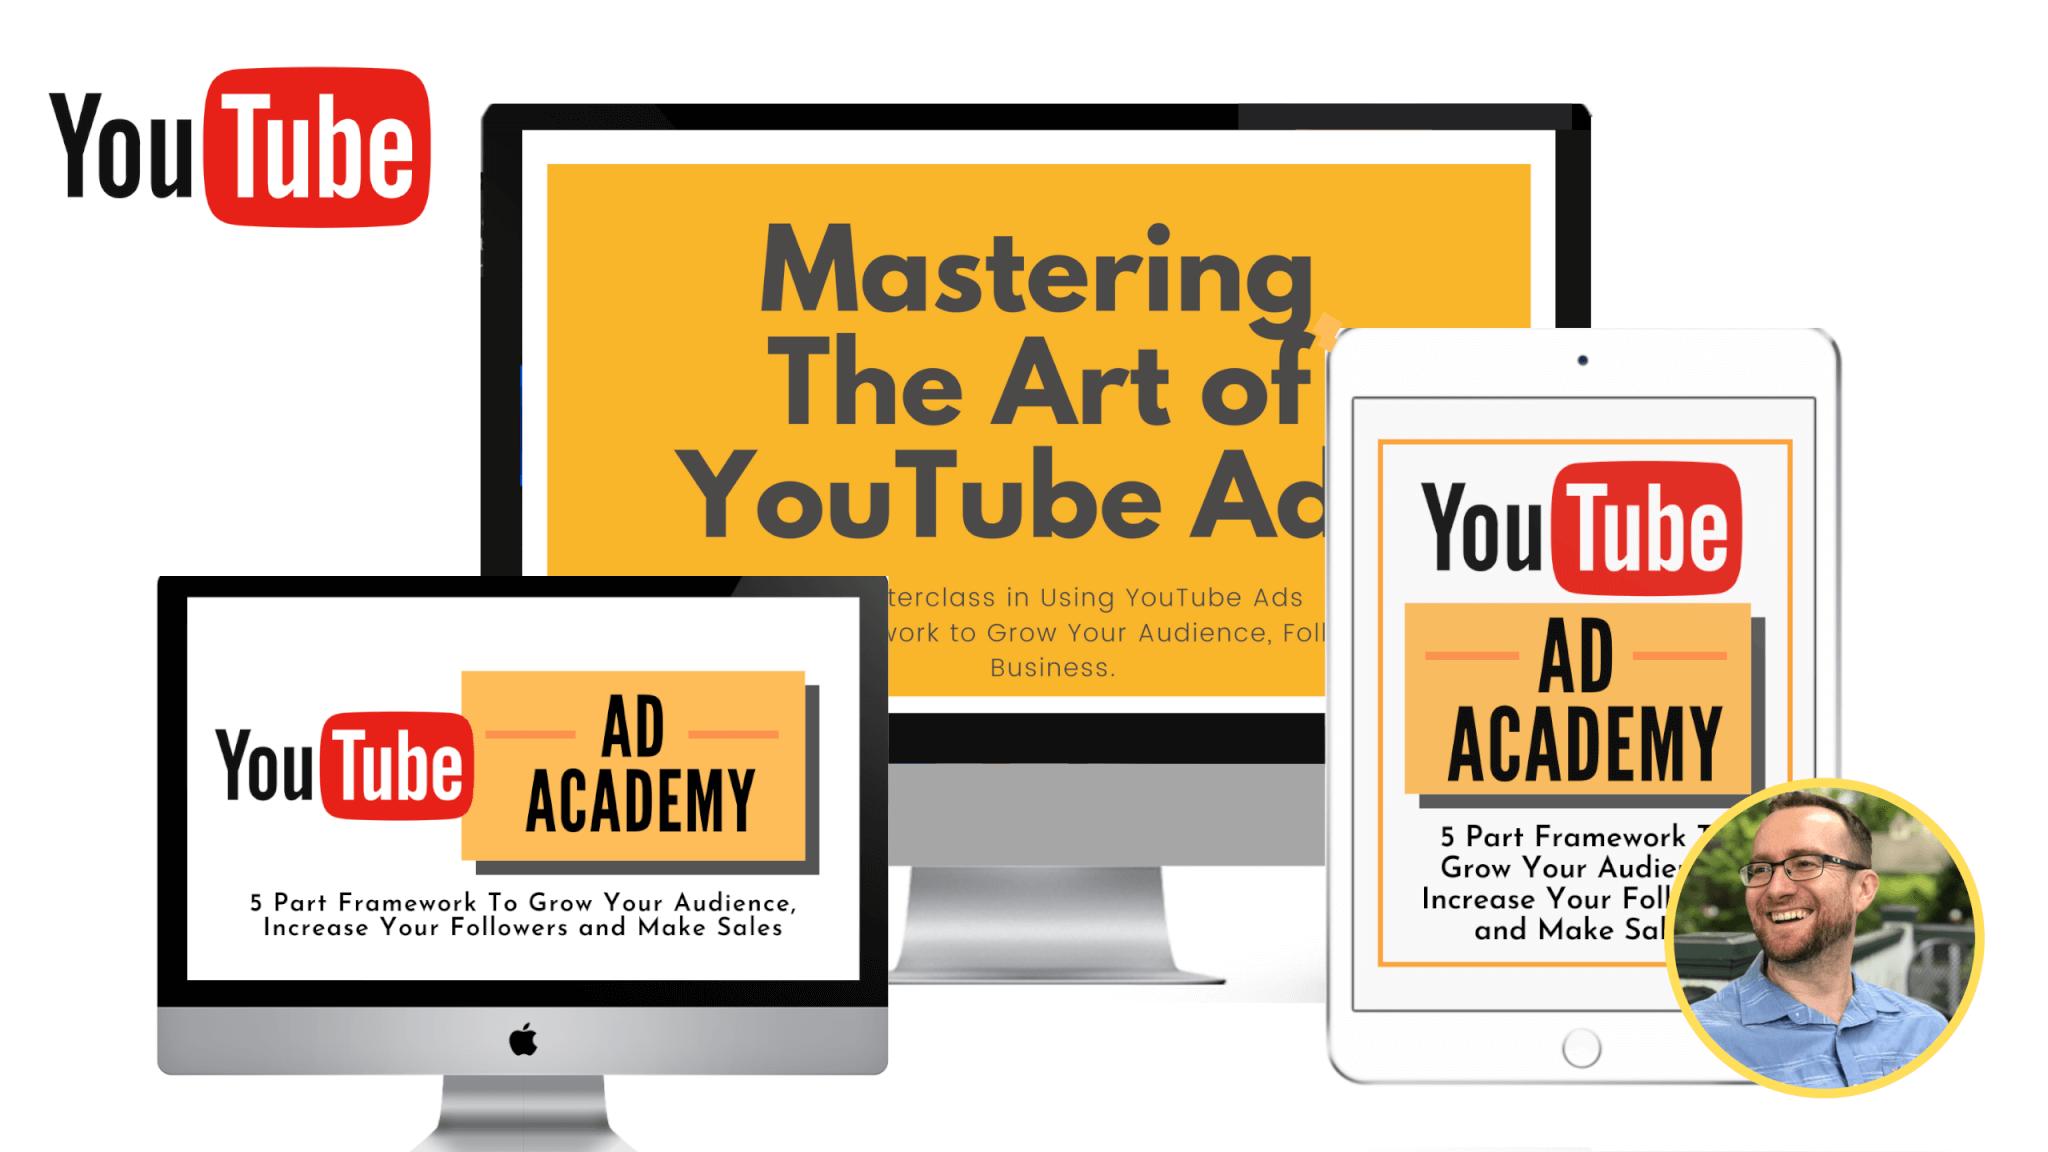 youtube-ads-academy-product-bundle